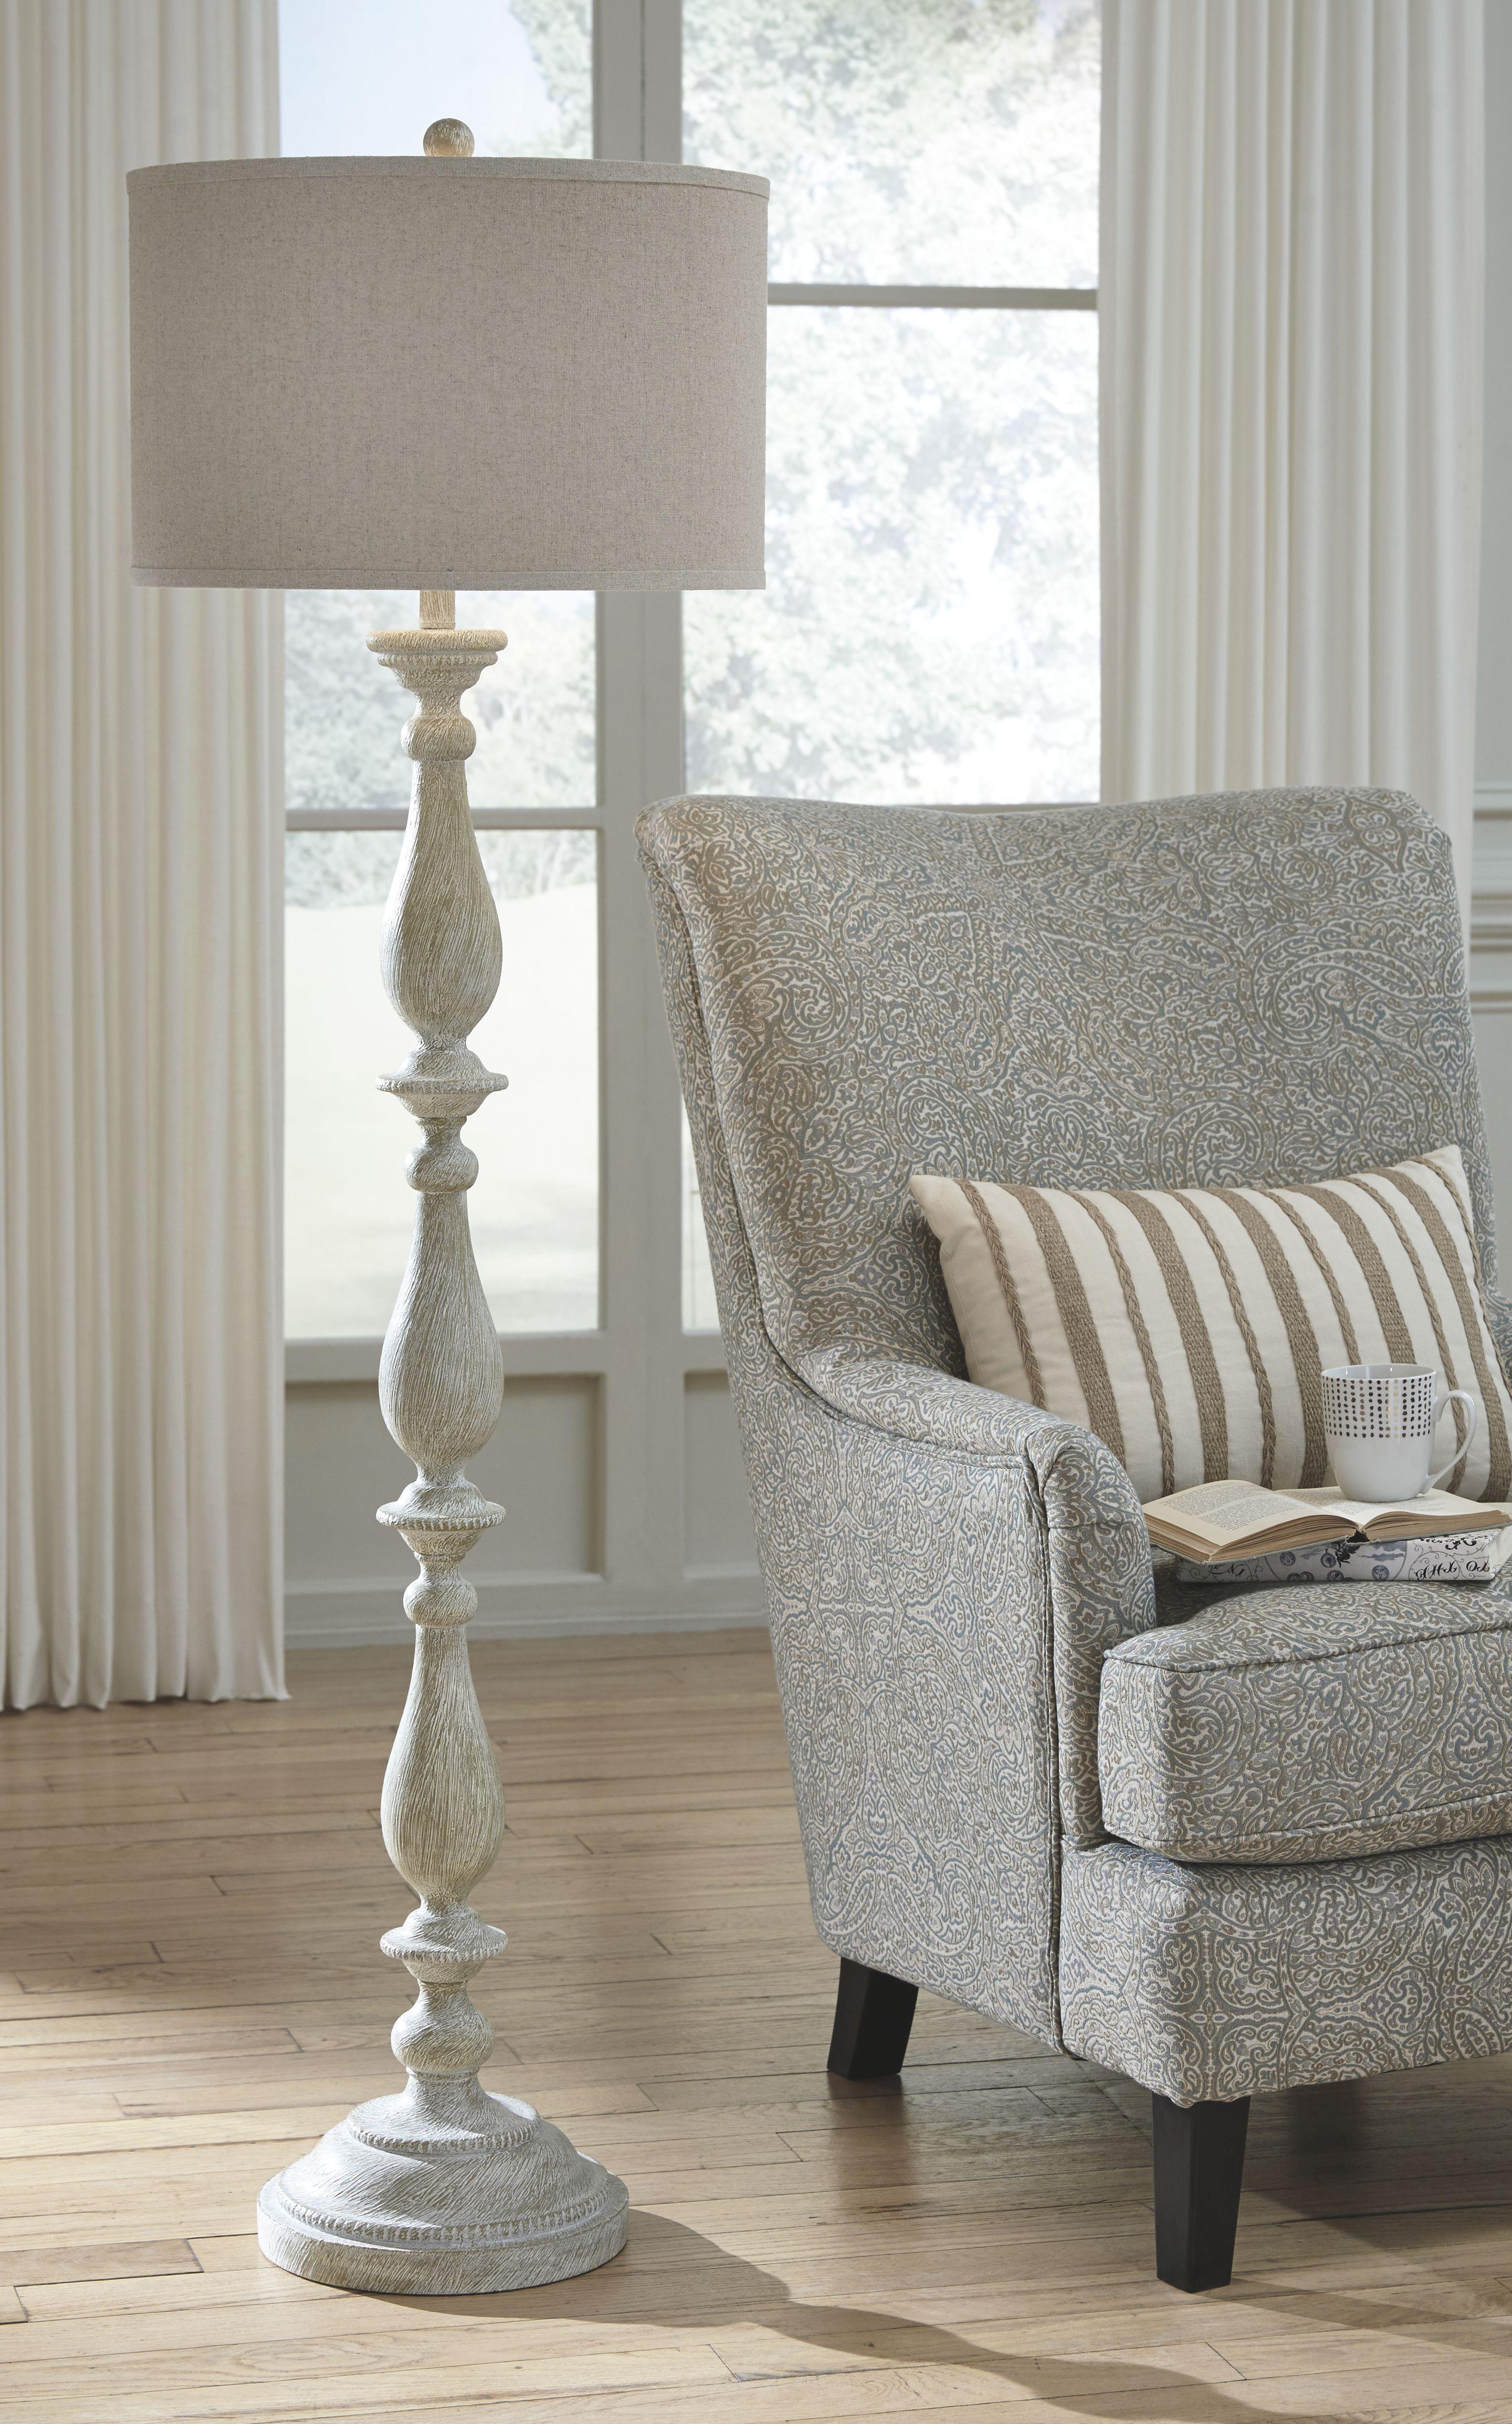 Bernadate floor lamp floor lamps living room white